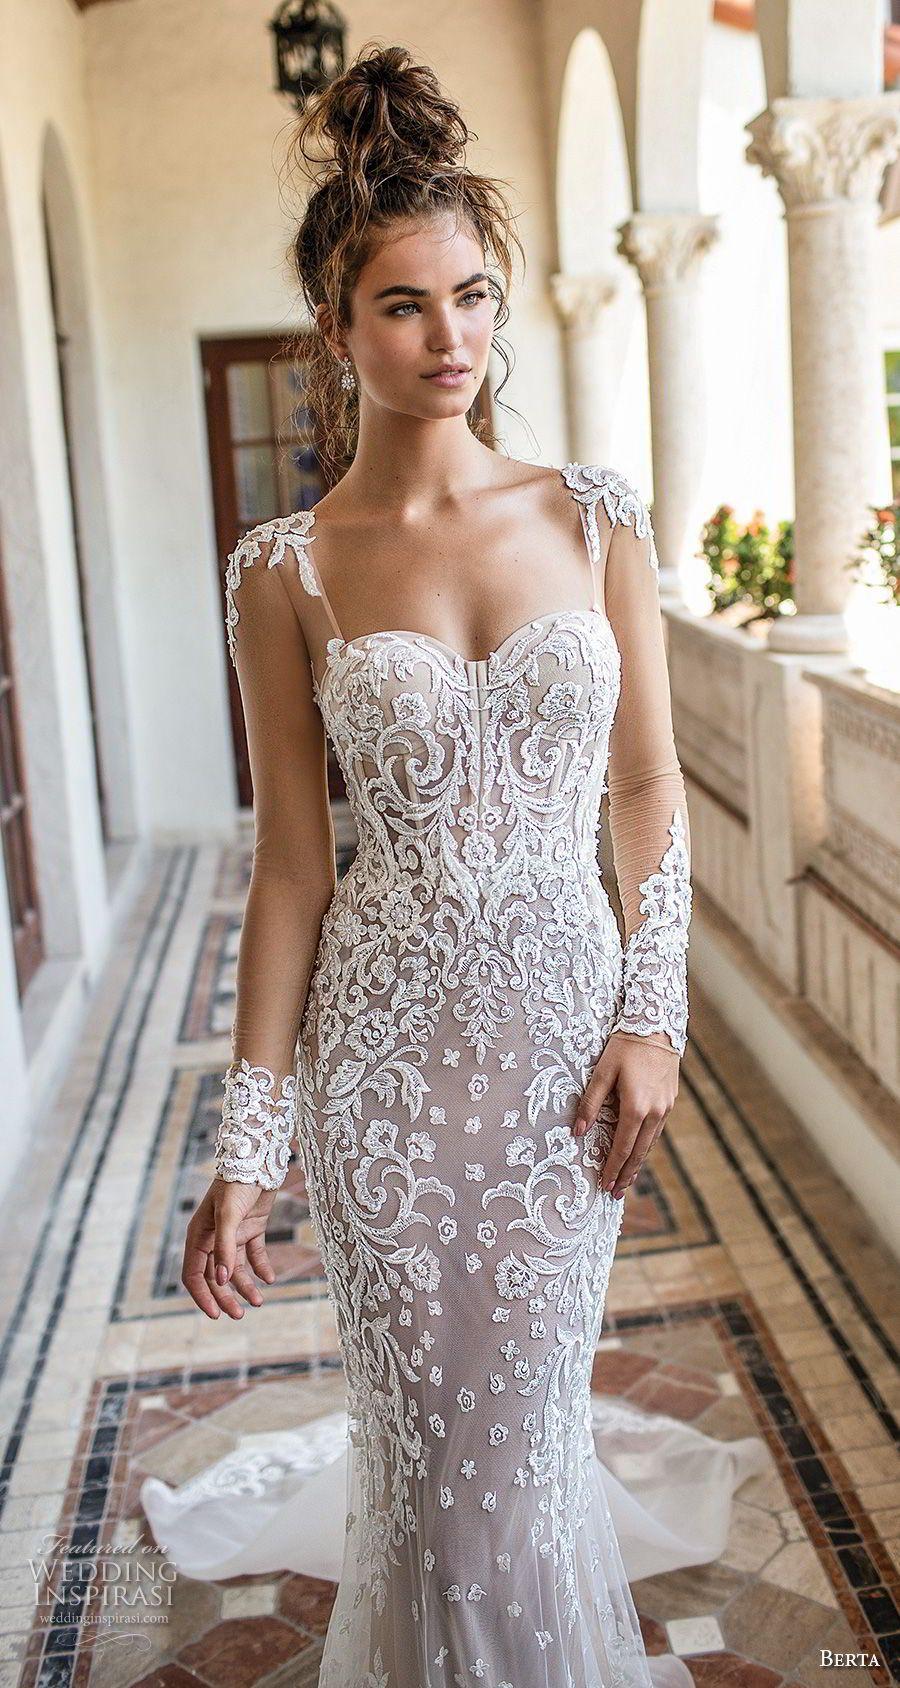 Sheer long sleeve wedding dress  Berta Spring  Wedding Dresses u ucMiamiud Bridal Collection